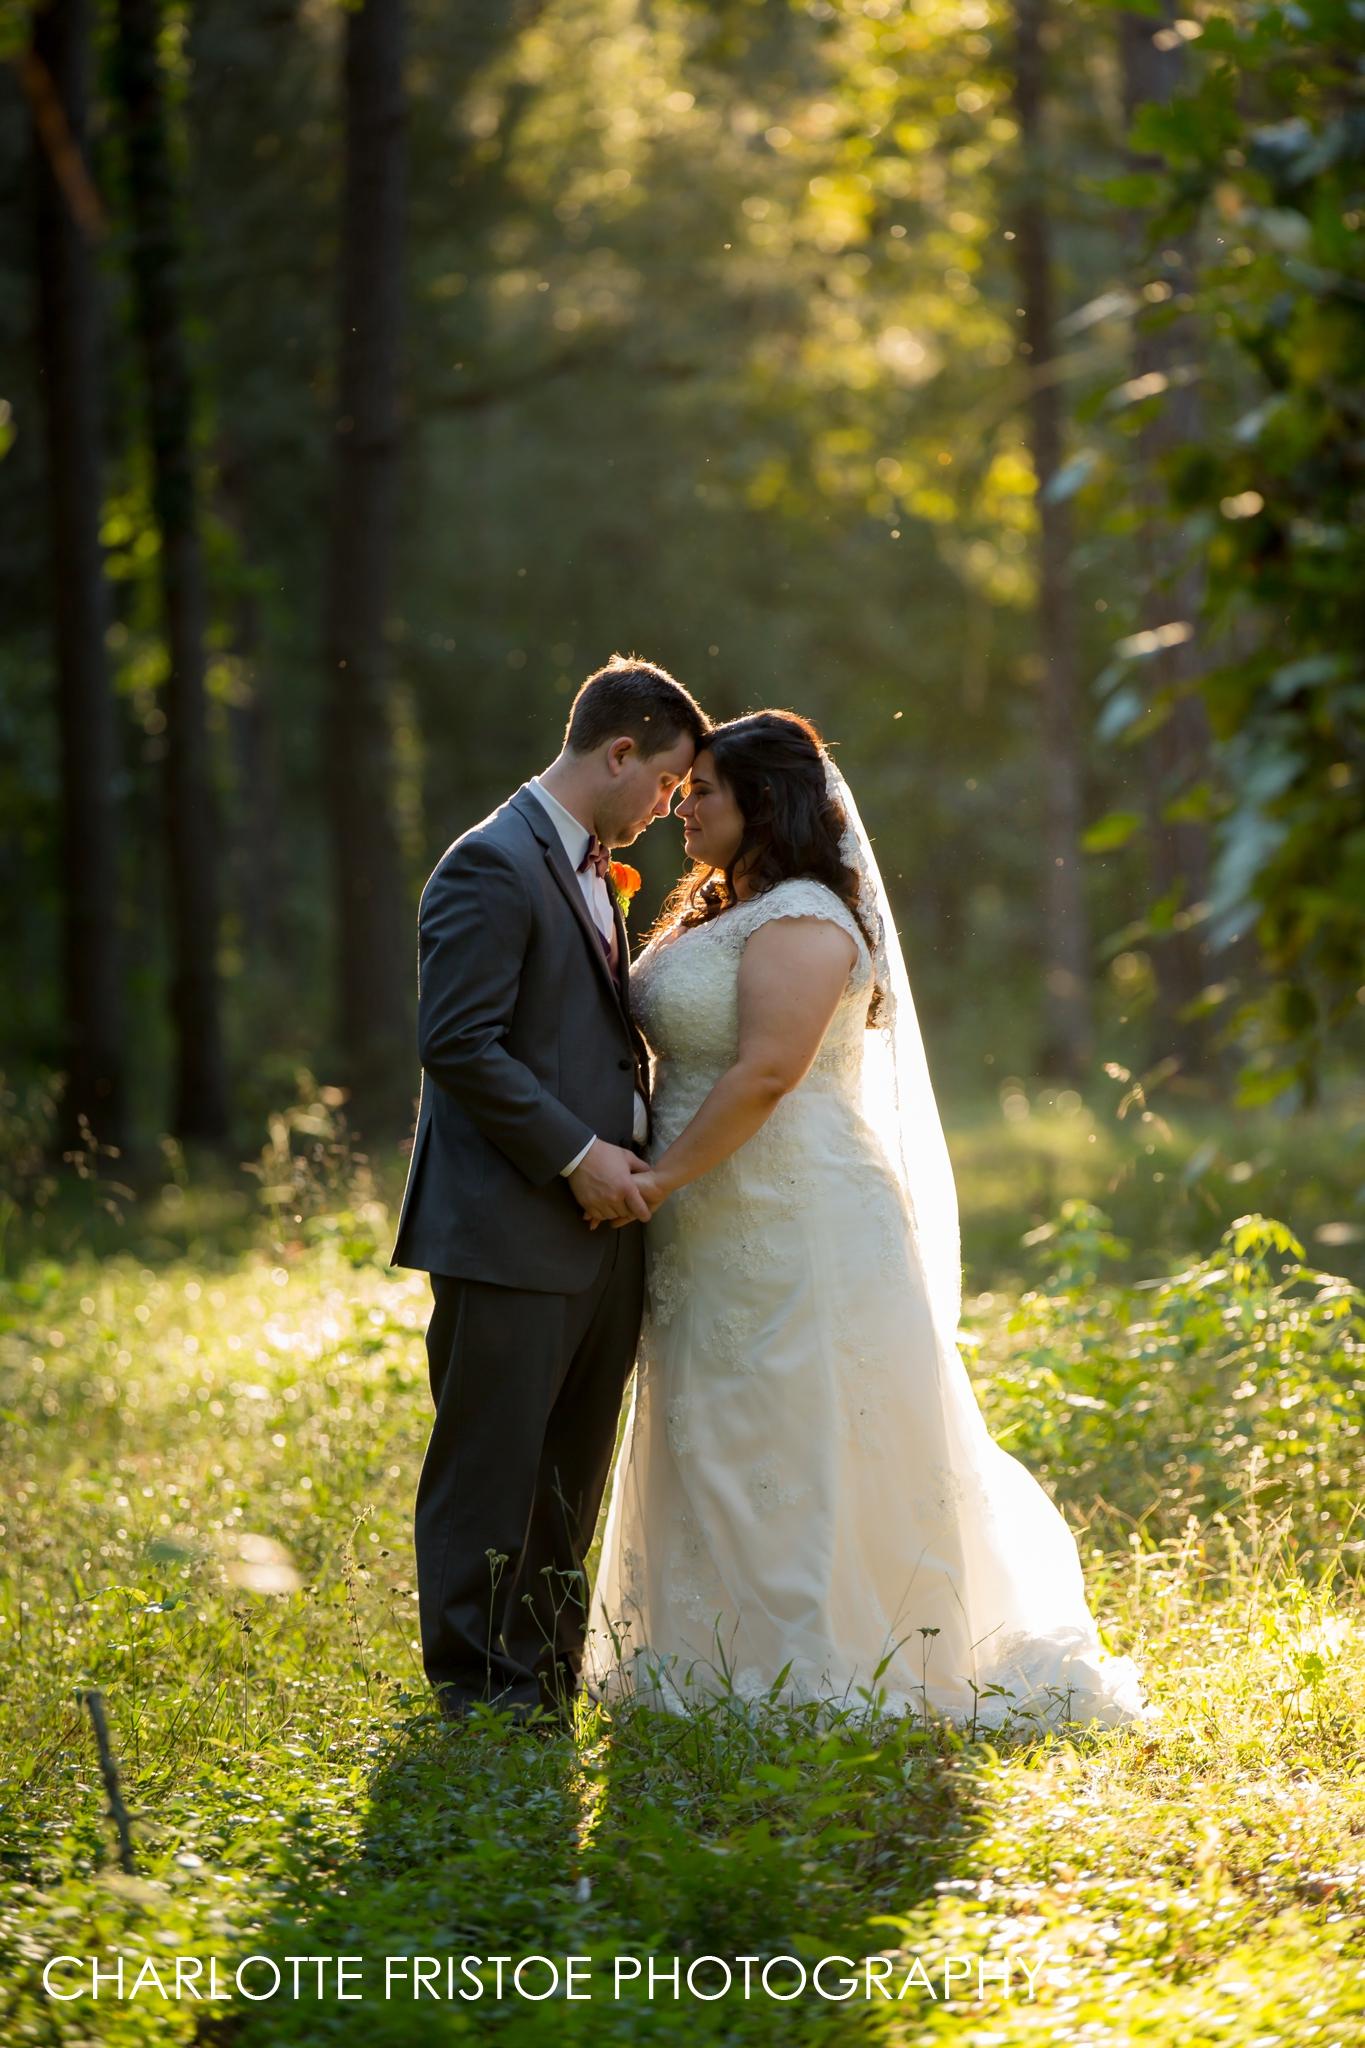 Lake Iamonia Wedding Charlotte Fristoe Photography-61.jpg